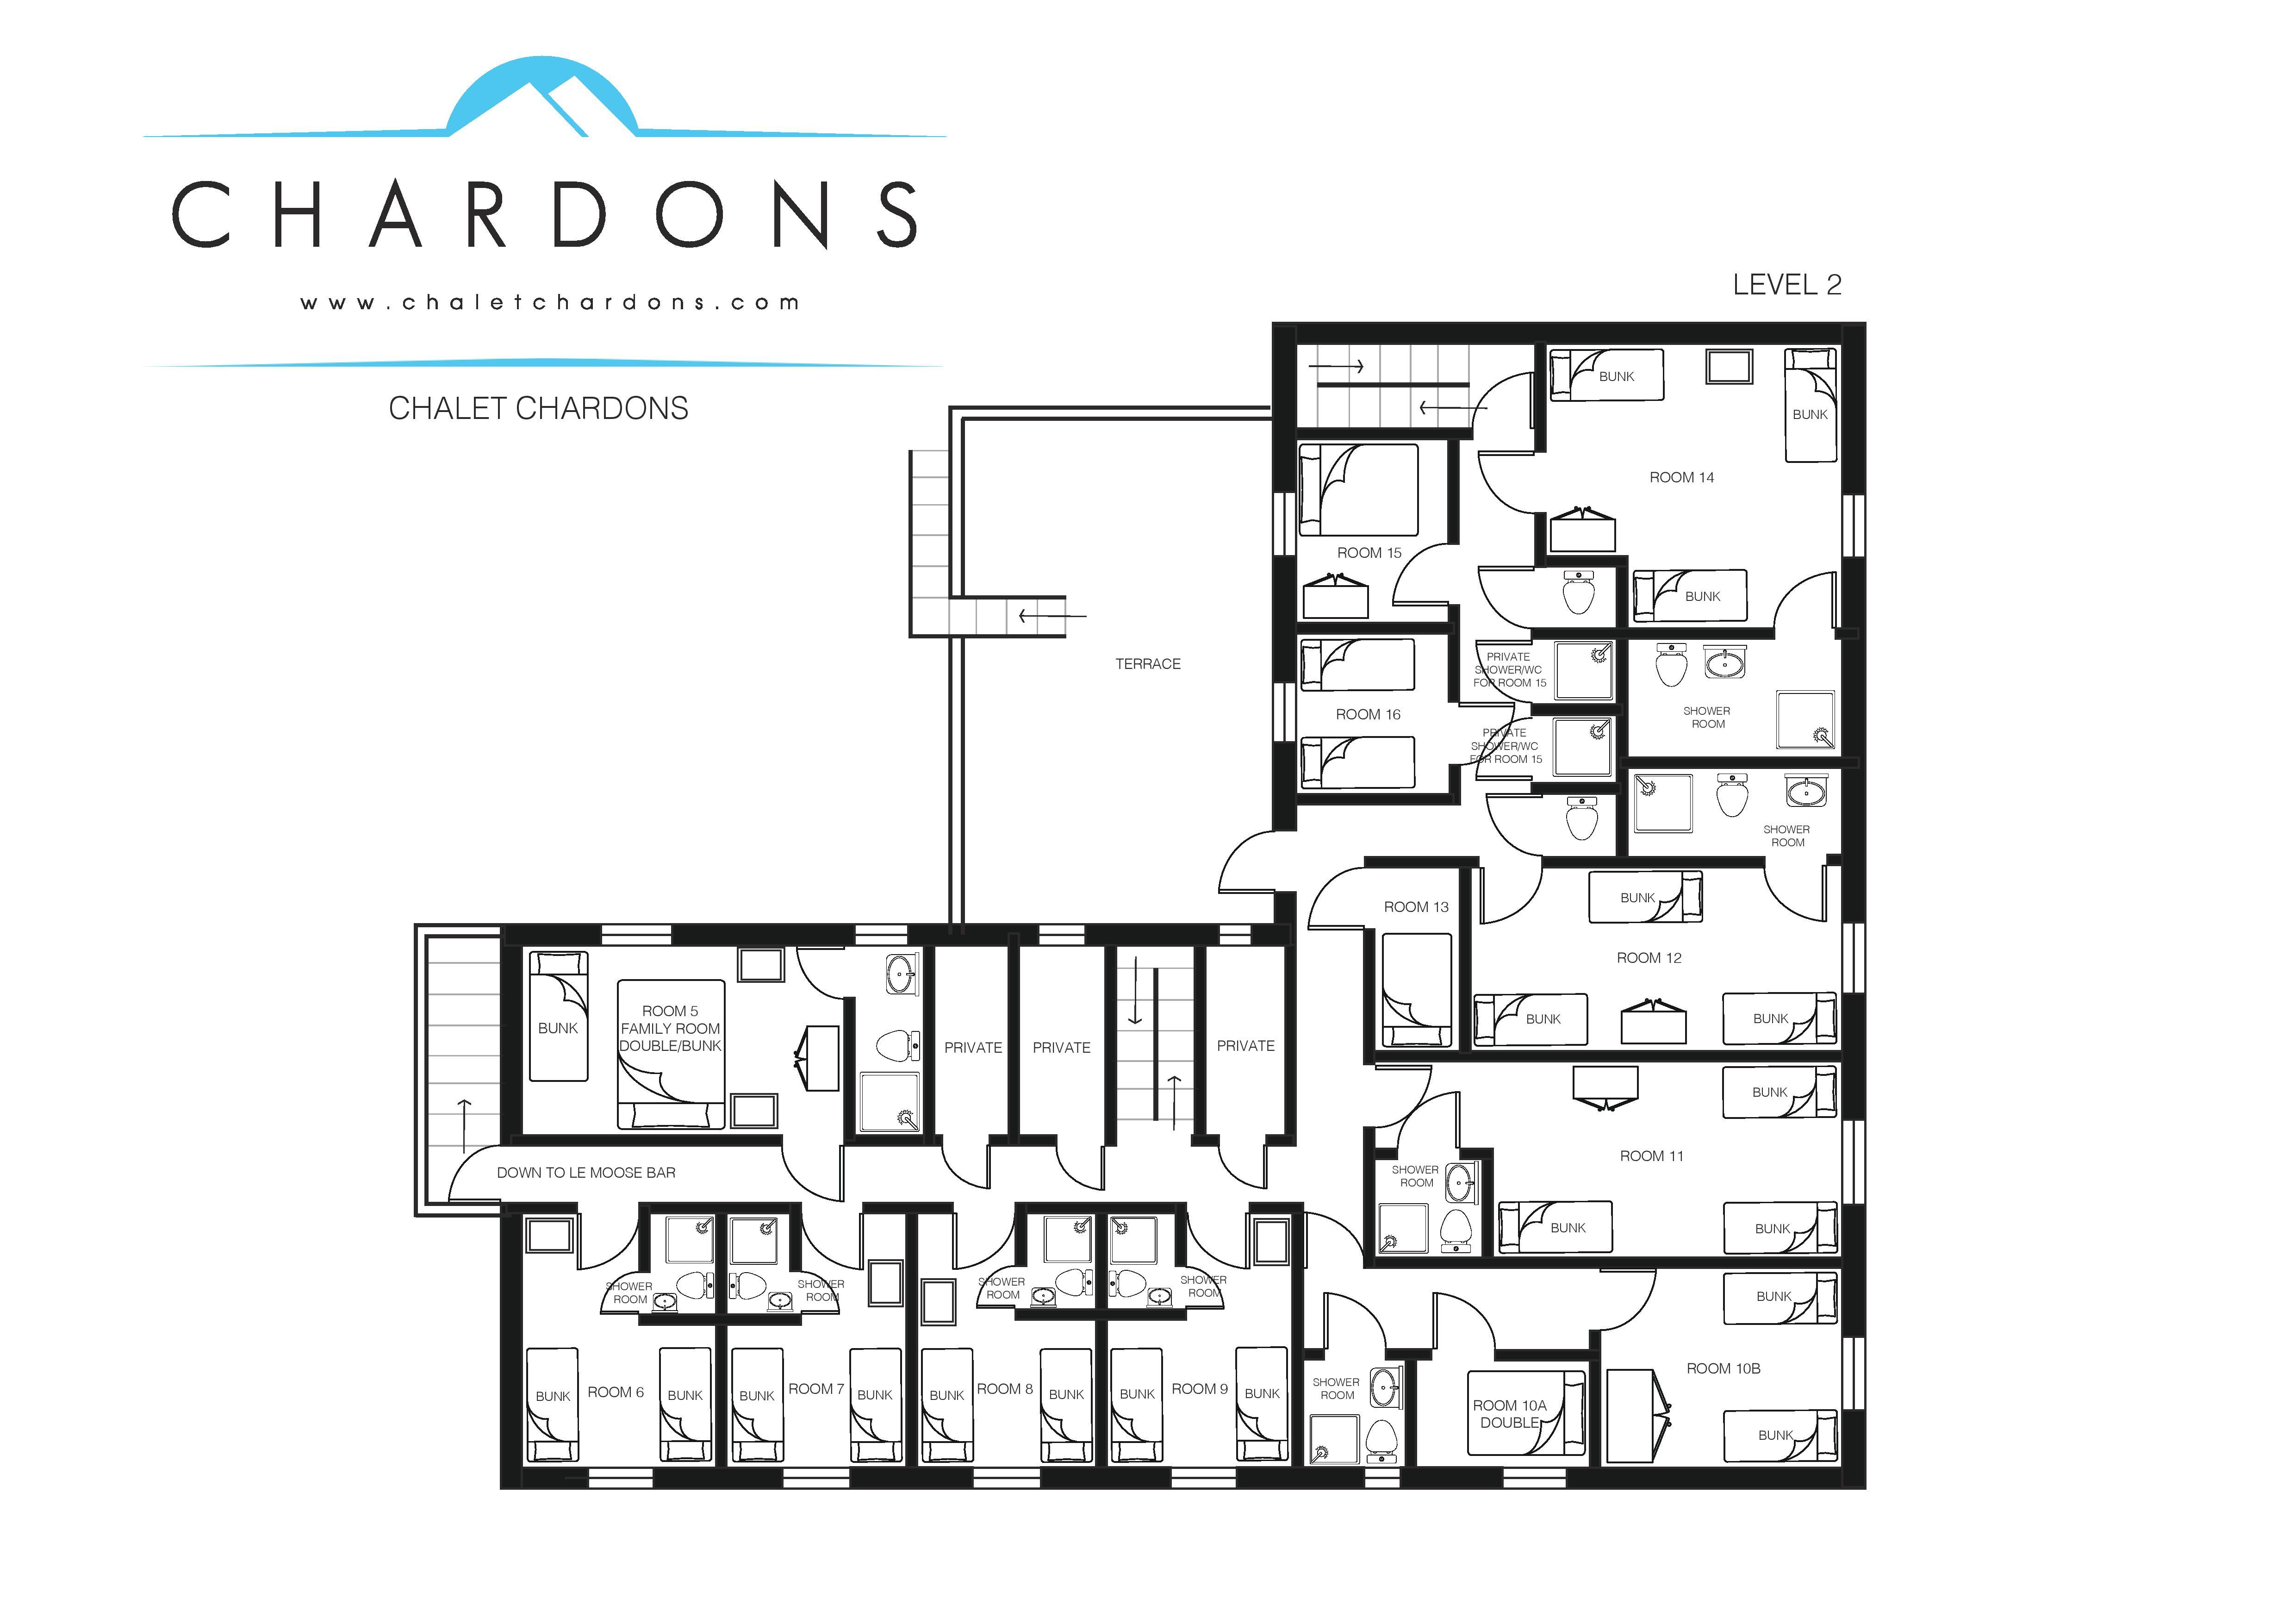 Chalet Chardons Floor Plan Level 2